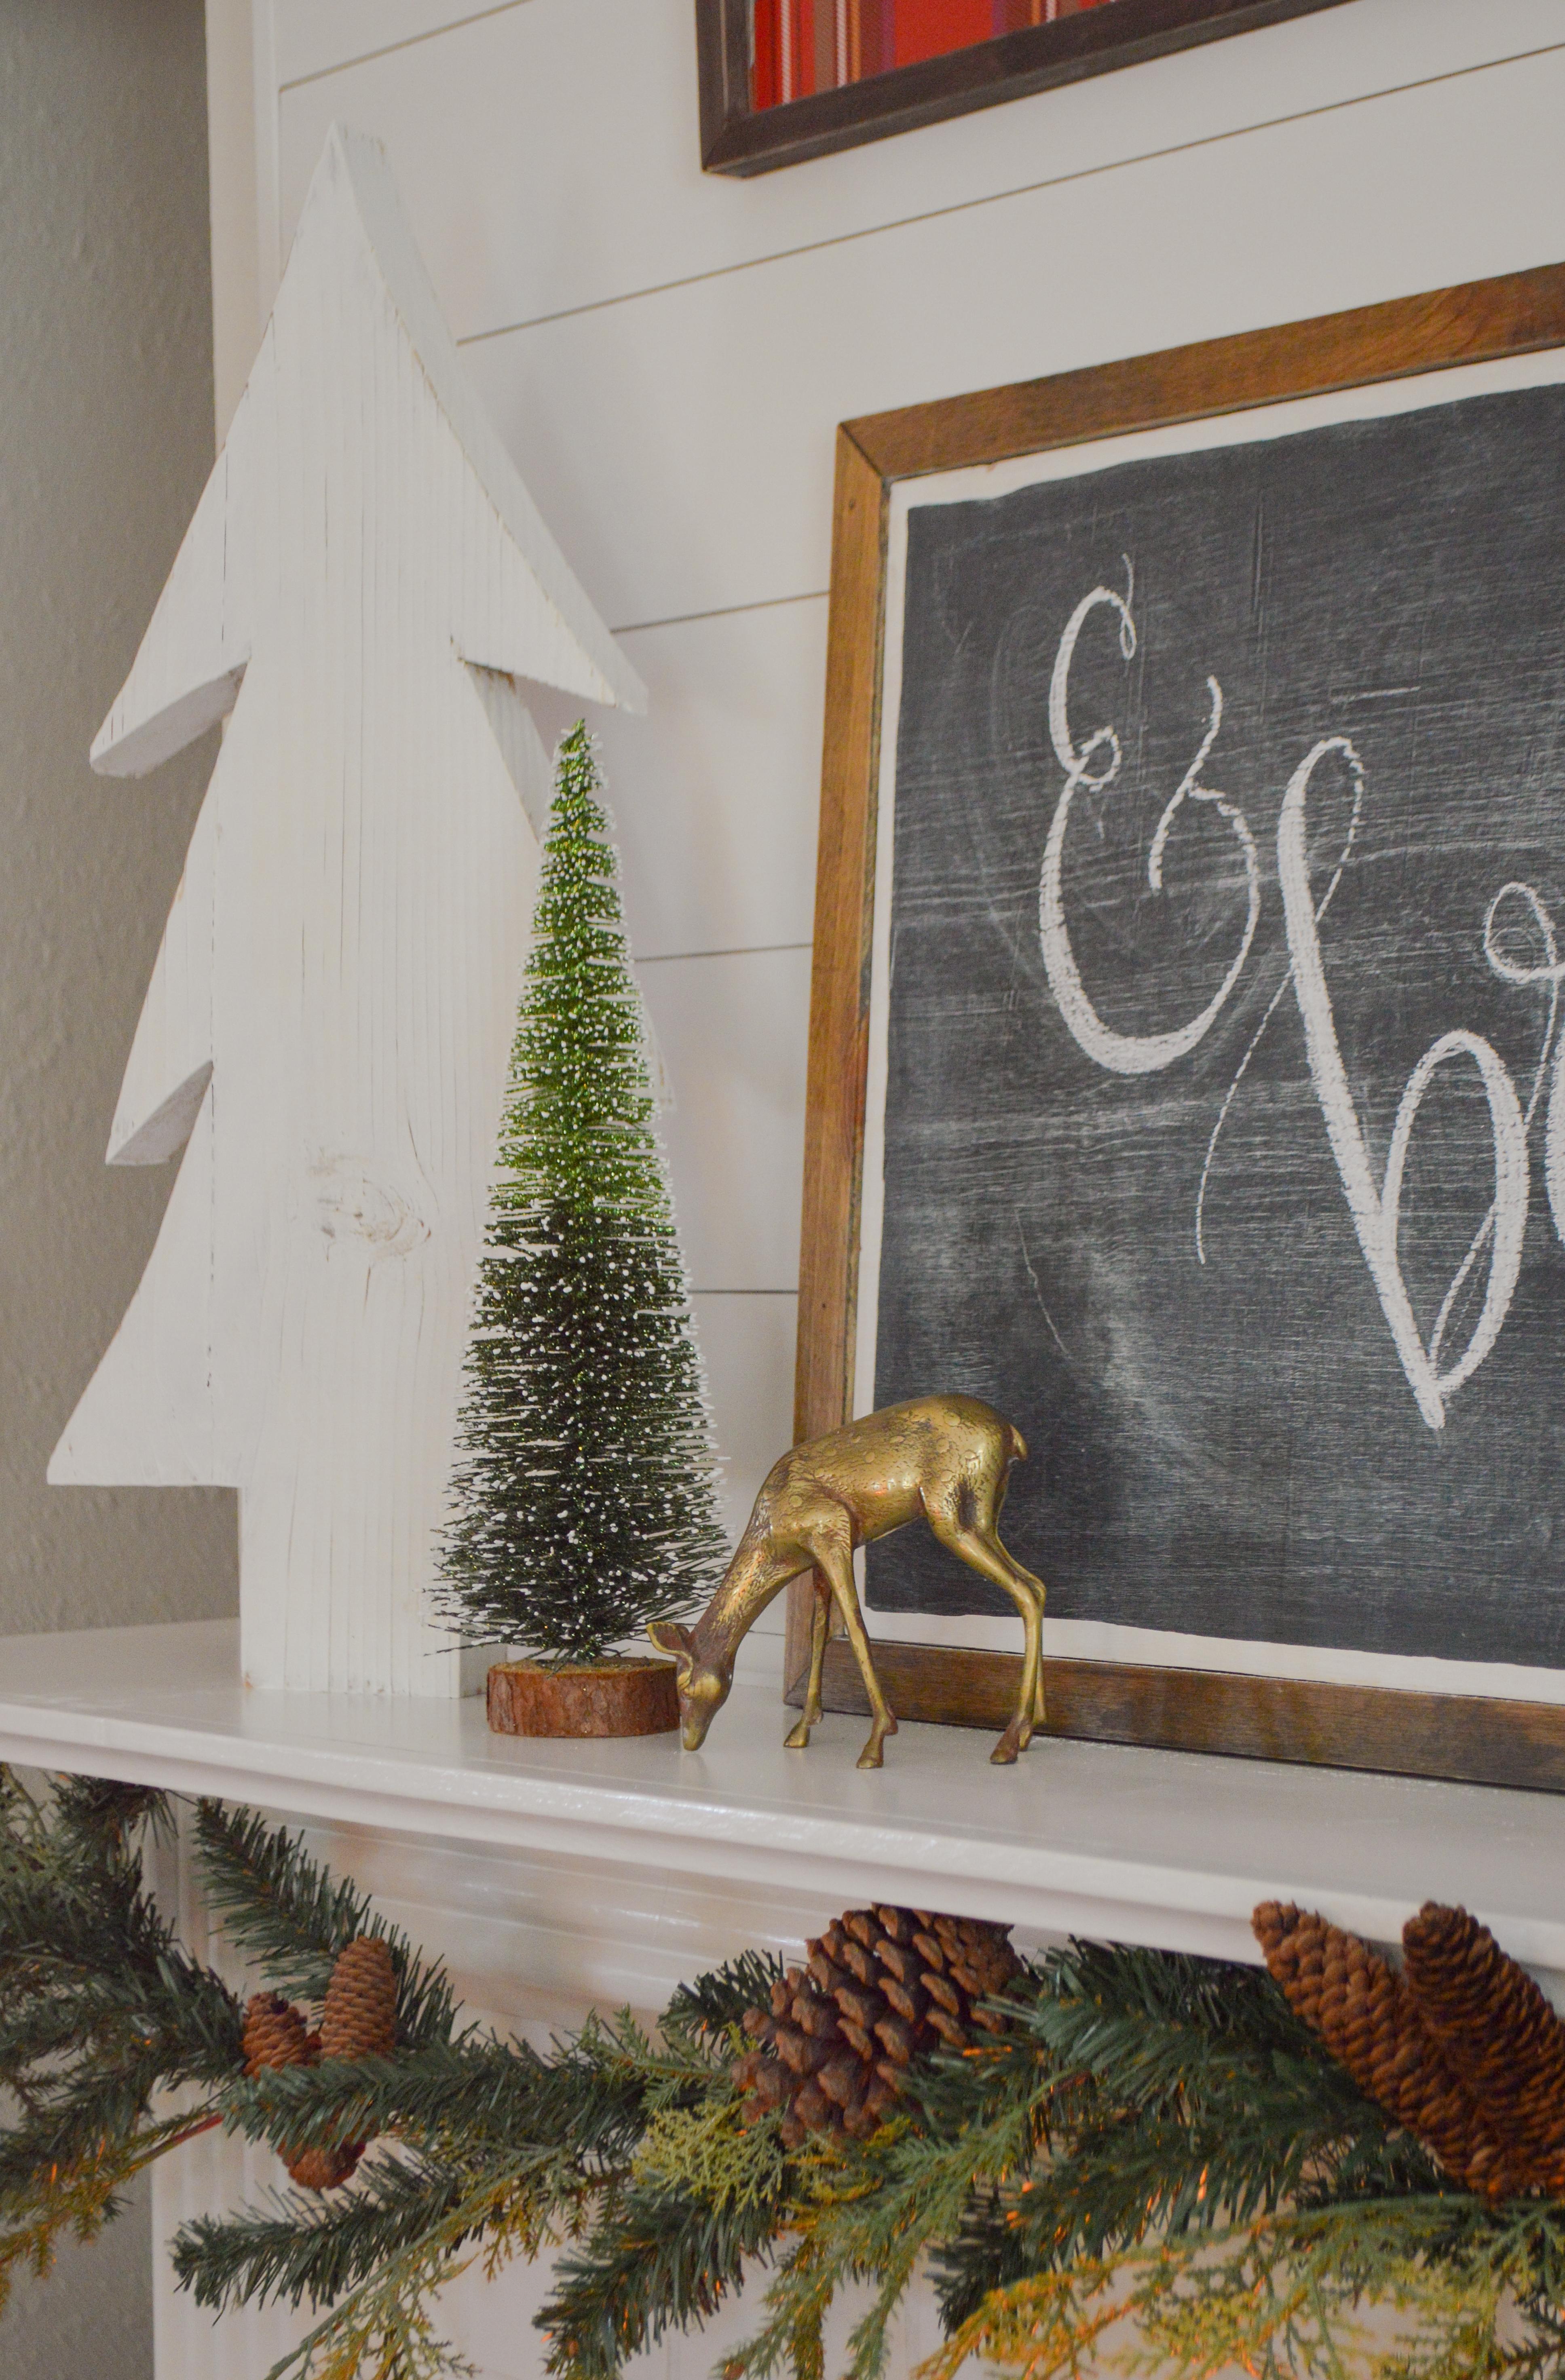 Holiday Housewalk Merry Christmas Home Tour - Fireplace decorating ideas, DIY wood trees, vintage brass deer, bottlebrush trees. #holidayhousewalk #christmashometour #cozychristmas #cottagechristmas #farmhousechristmas